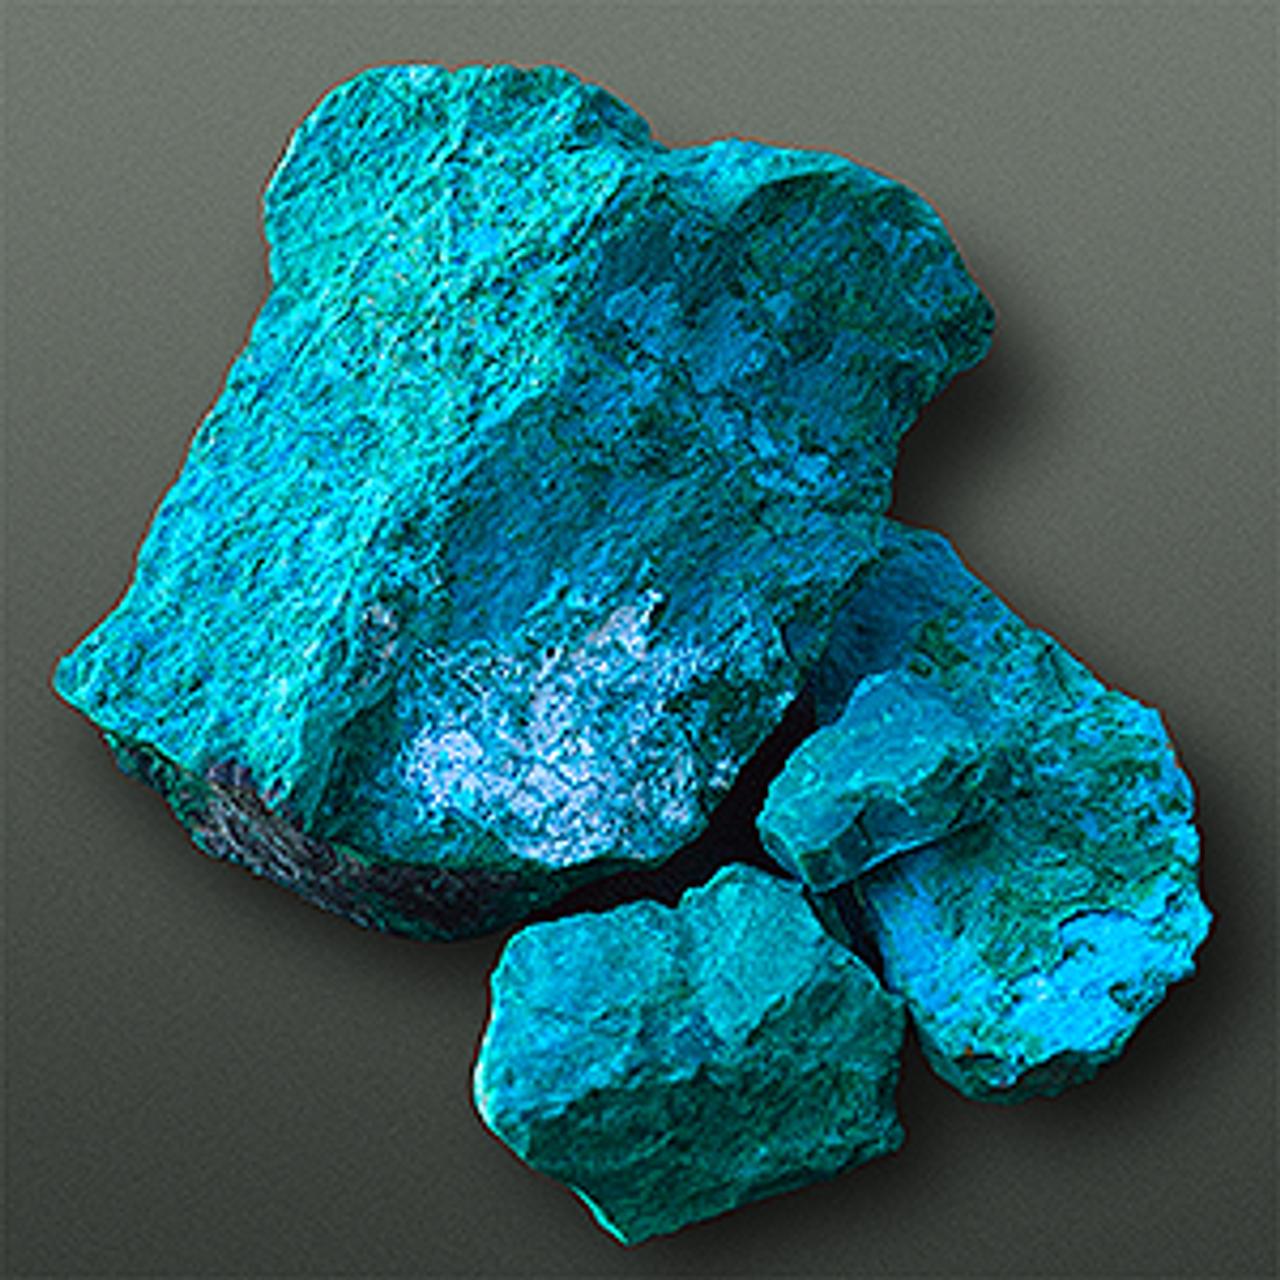 Chrysocolla pigments